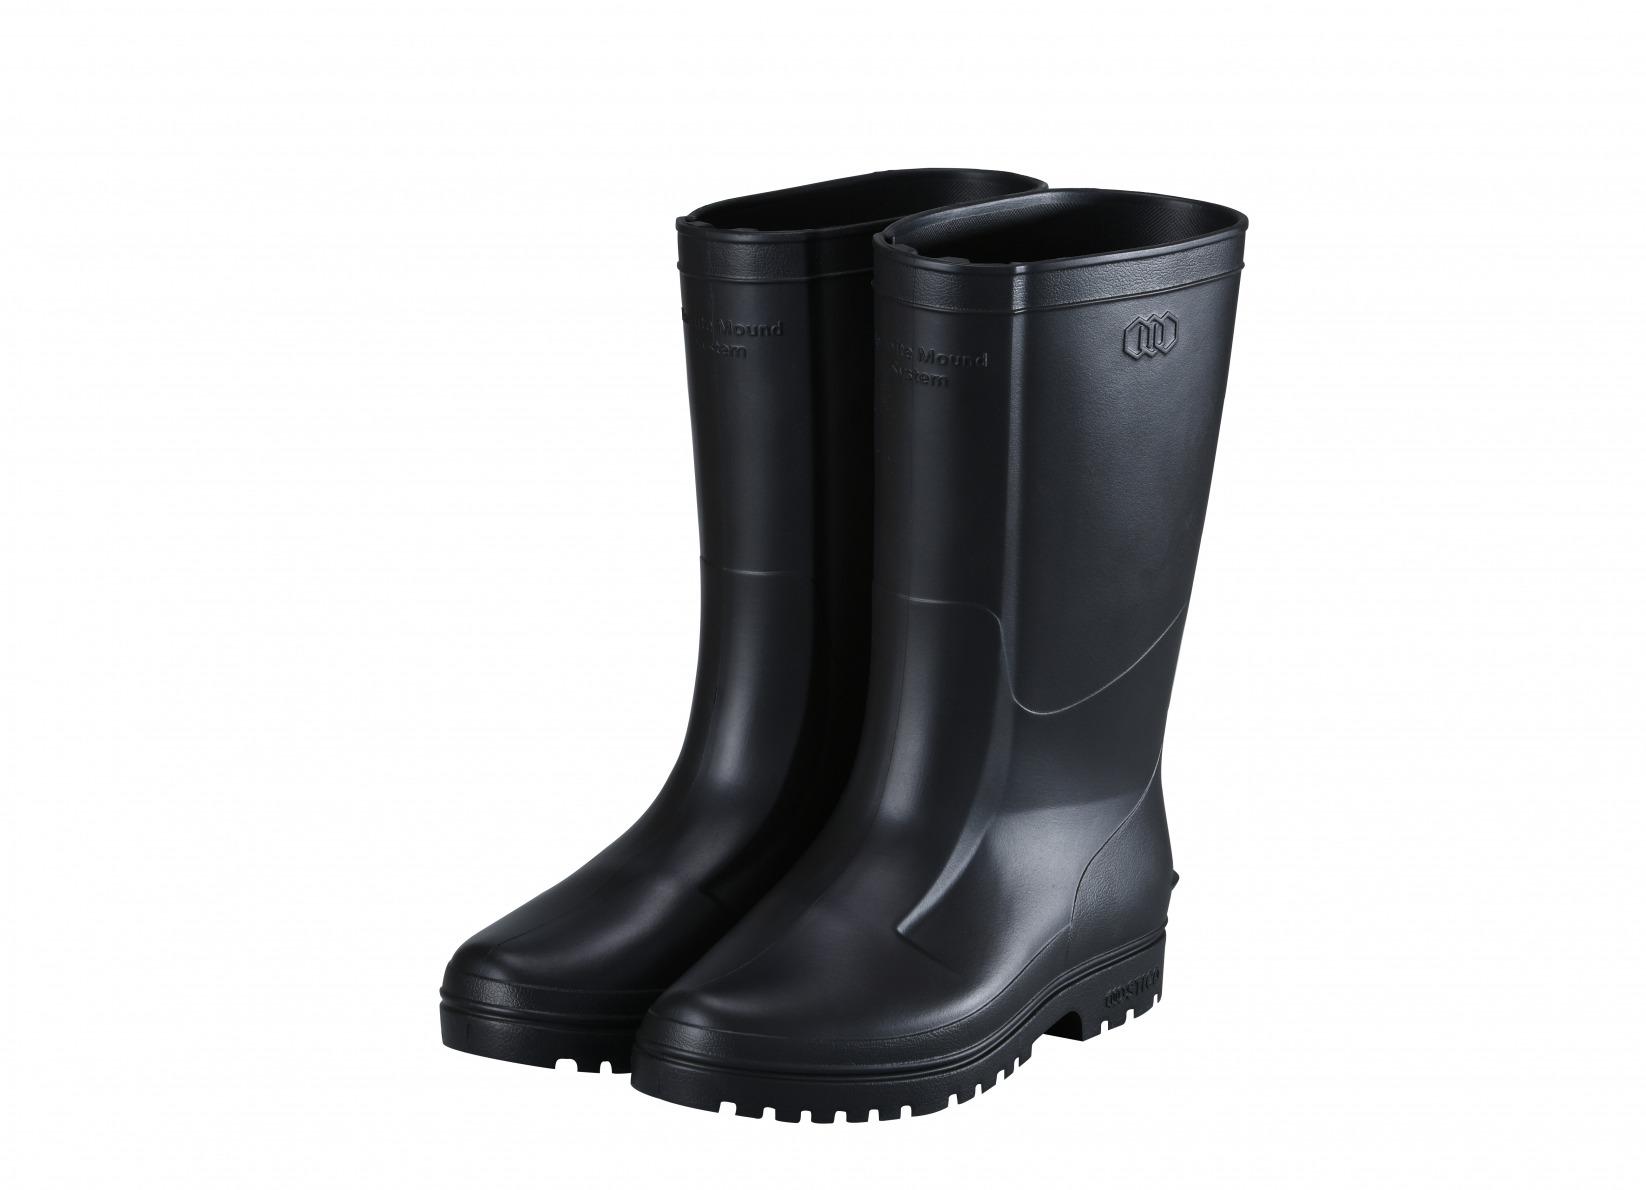 STICO SEB-10 長靴タイプ ブラック/ホワイト